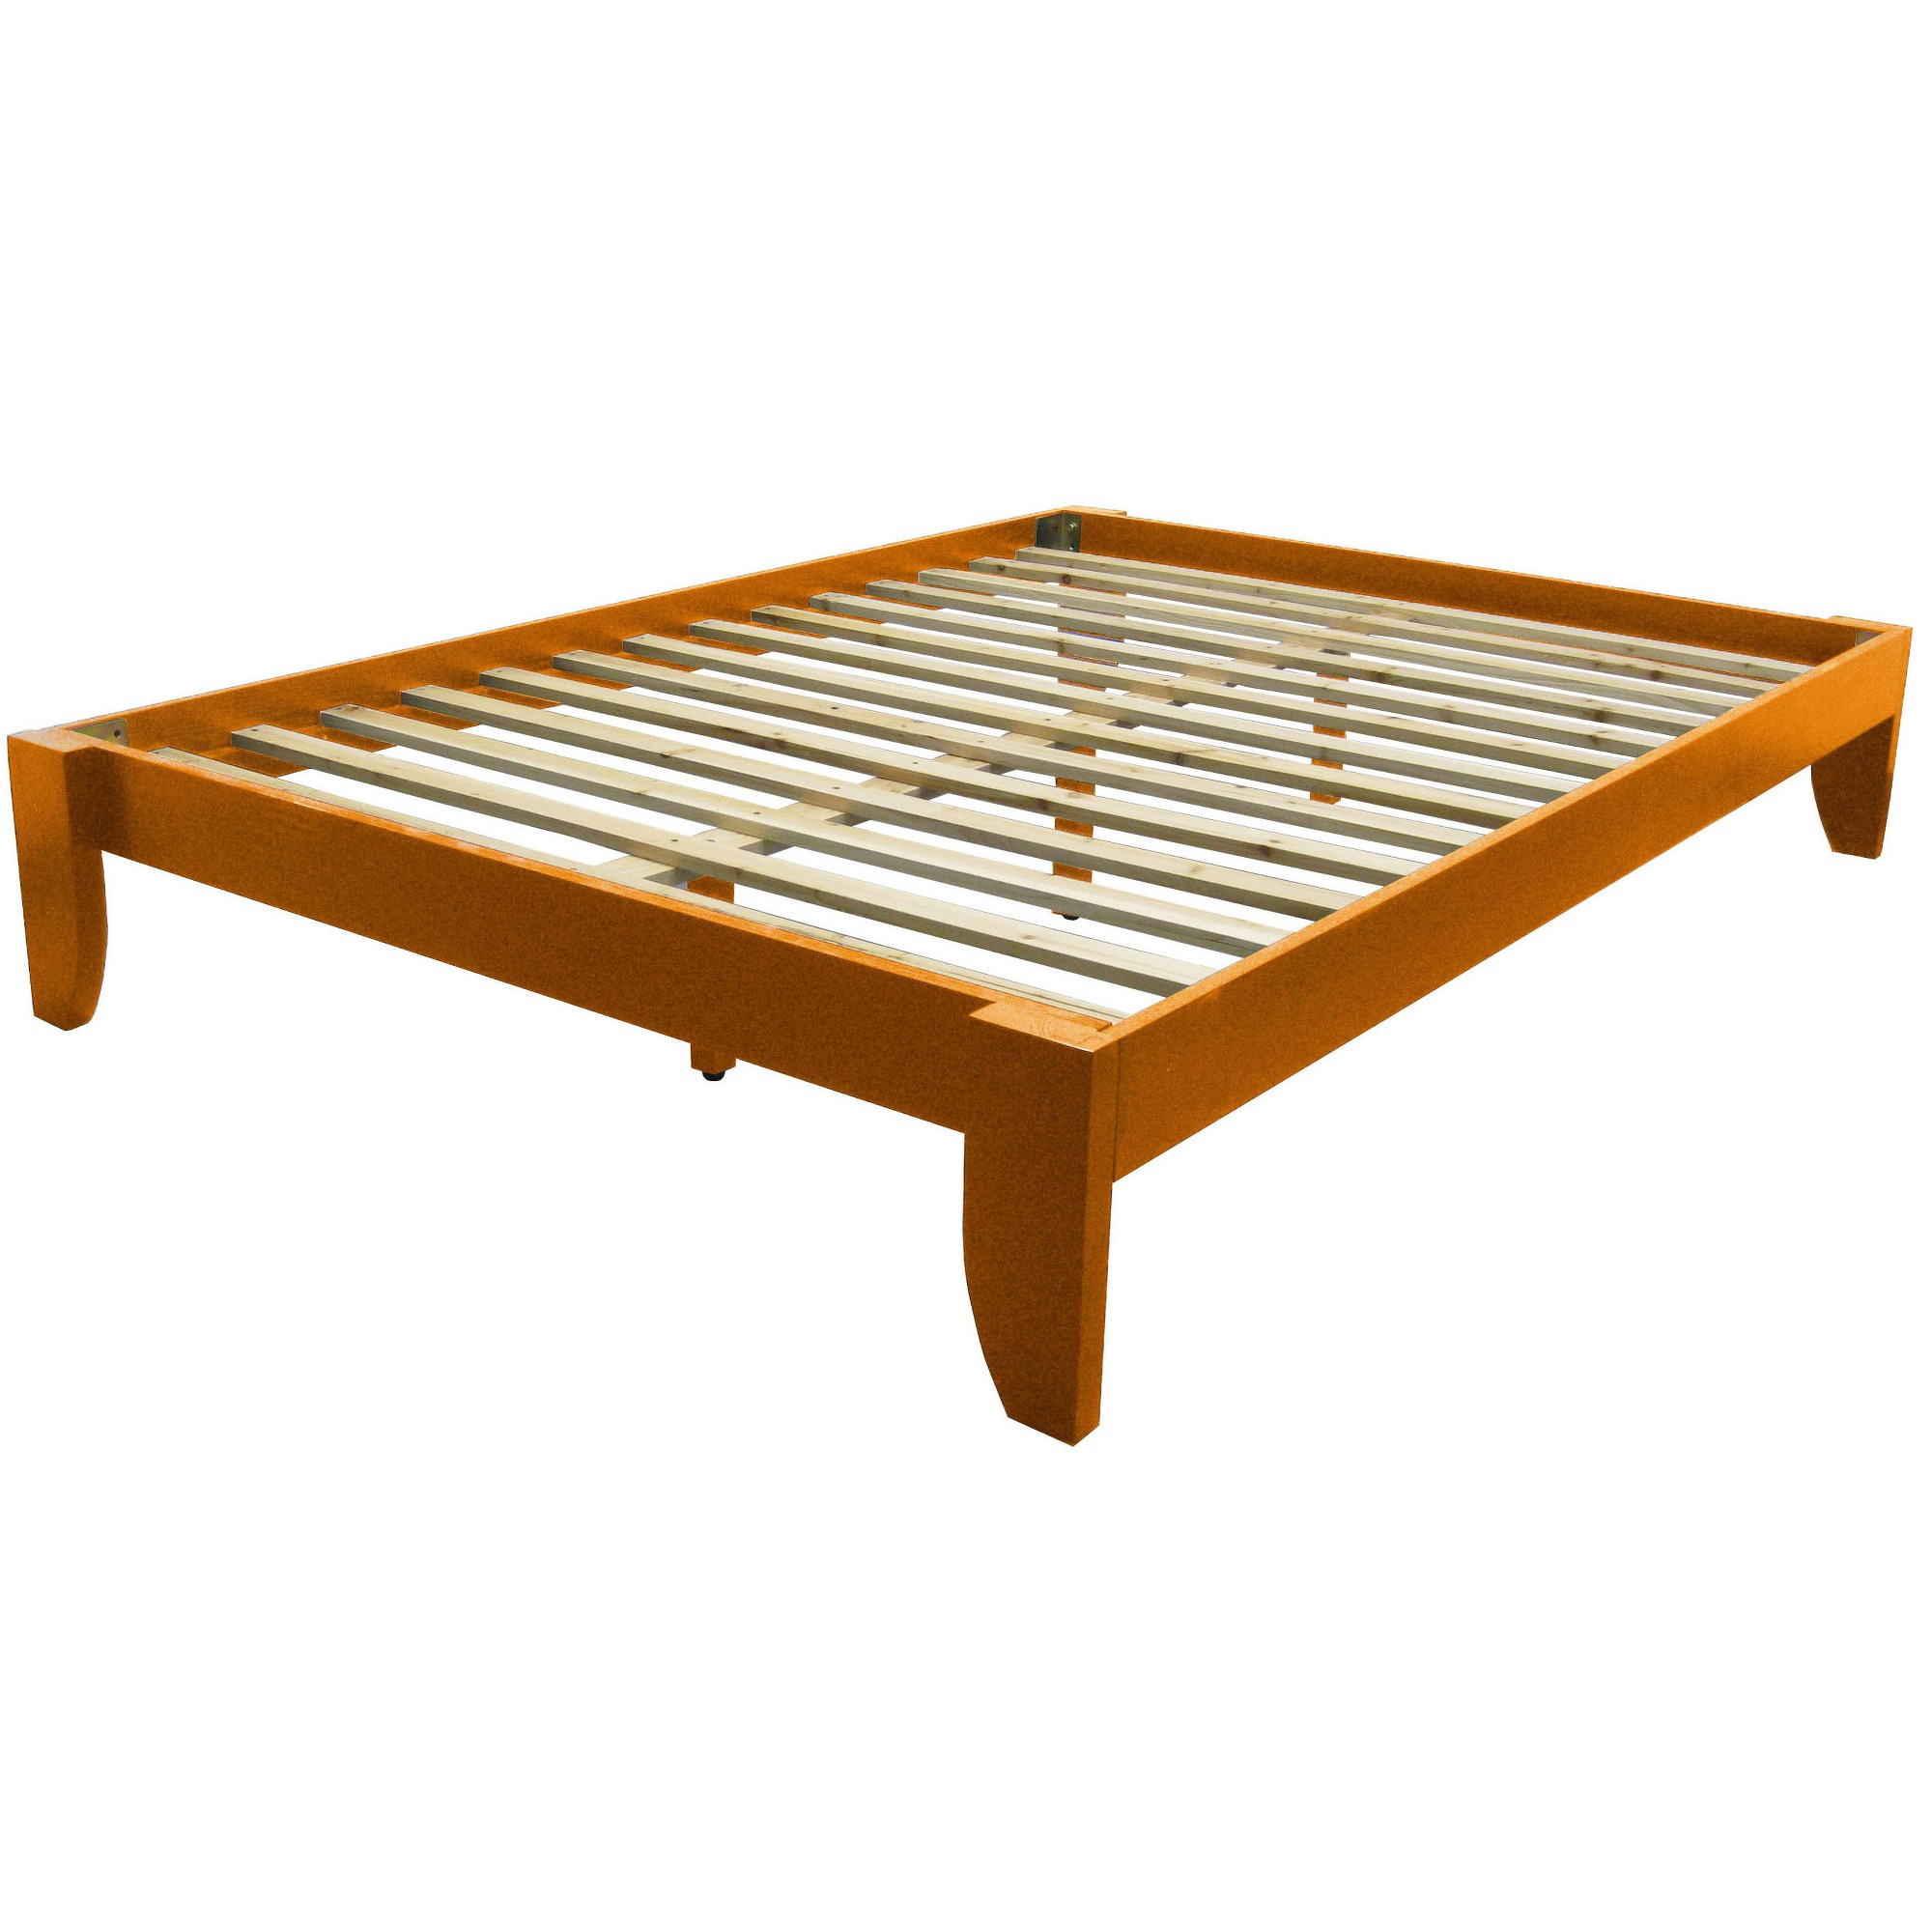 cedar log queen beds juniper rustic maxwell twisted bed frame size